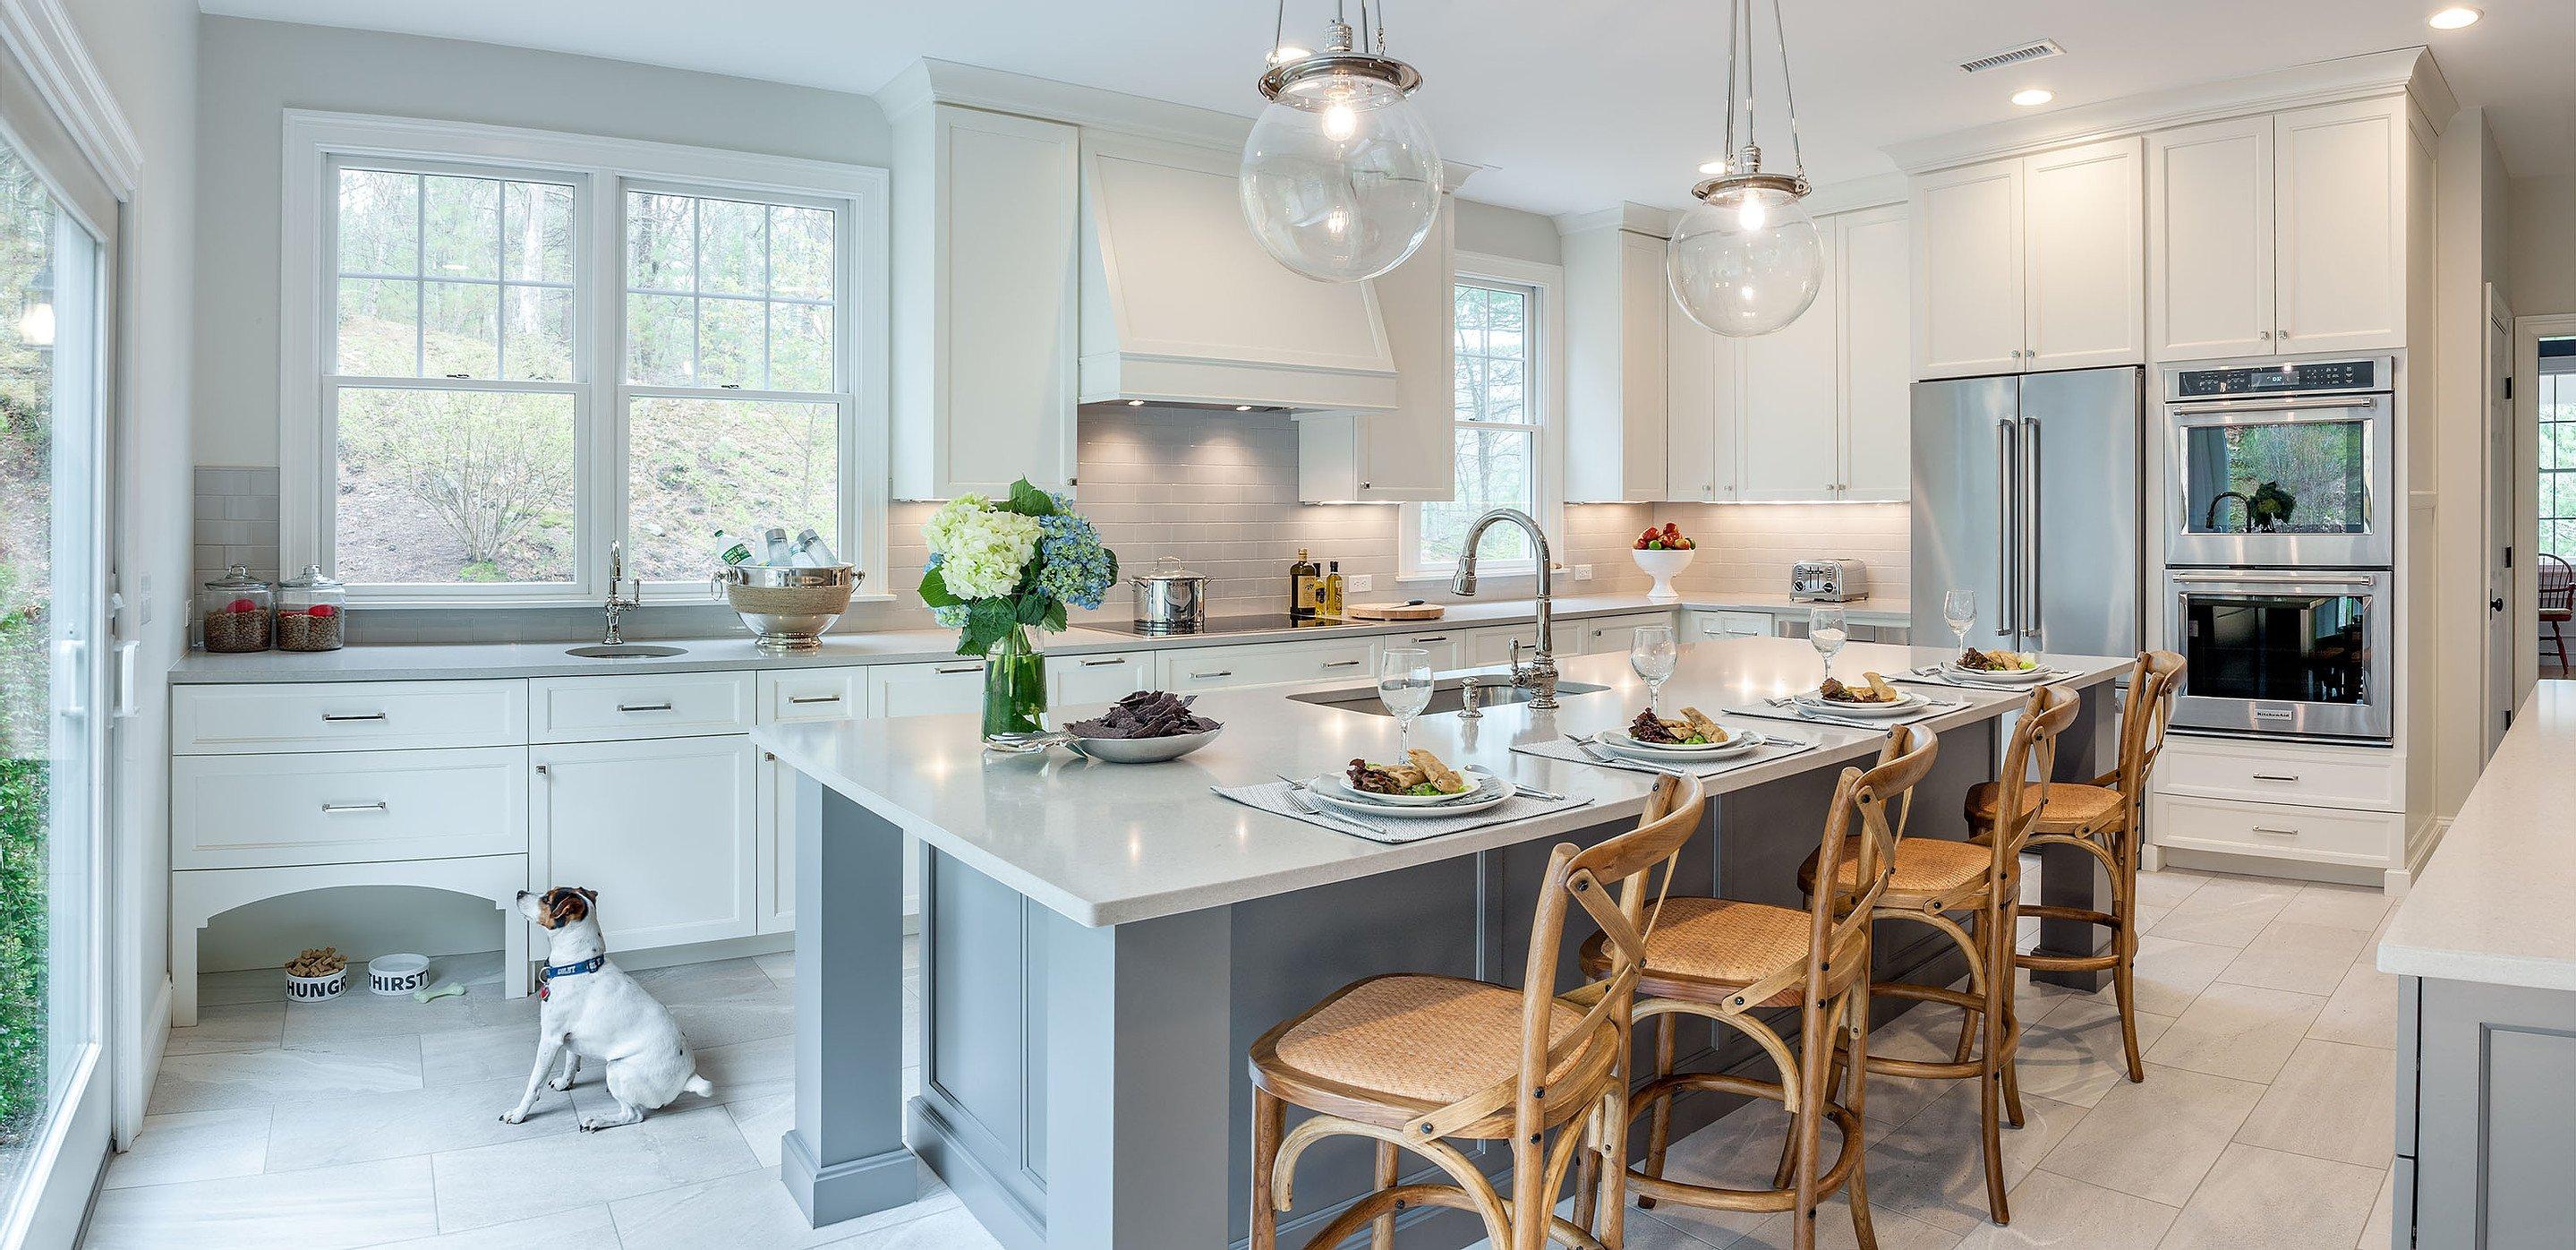 Home renovation timeline: How long should a remodel take?